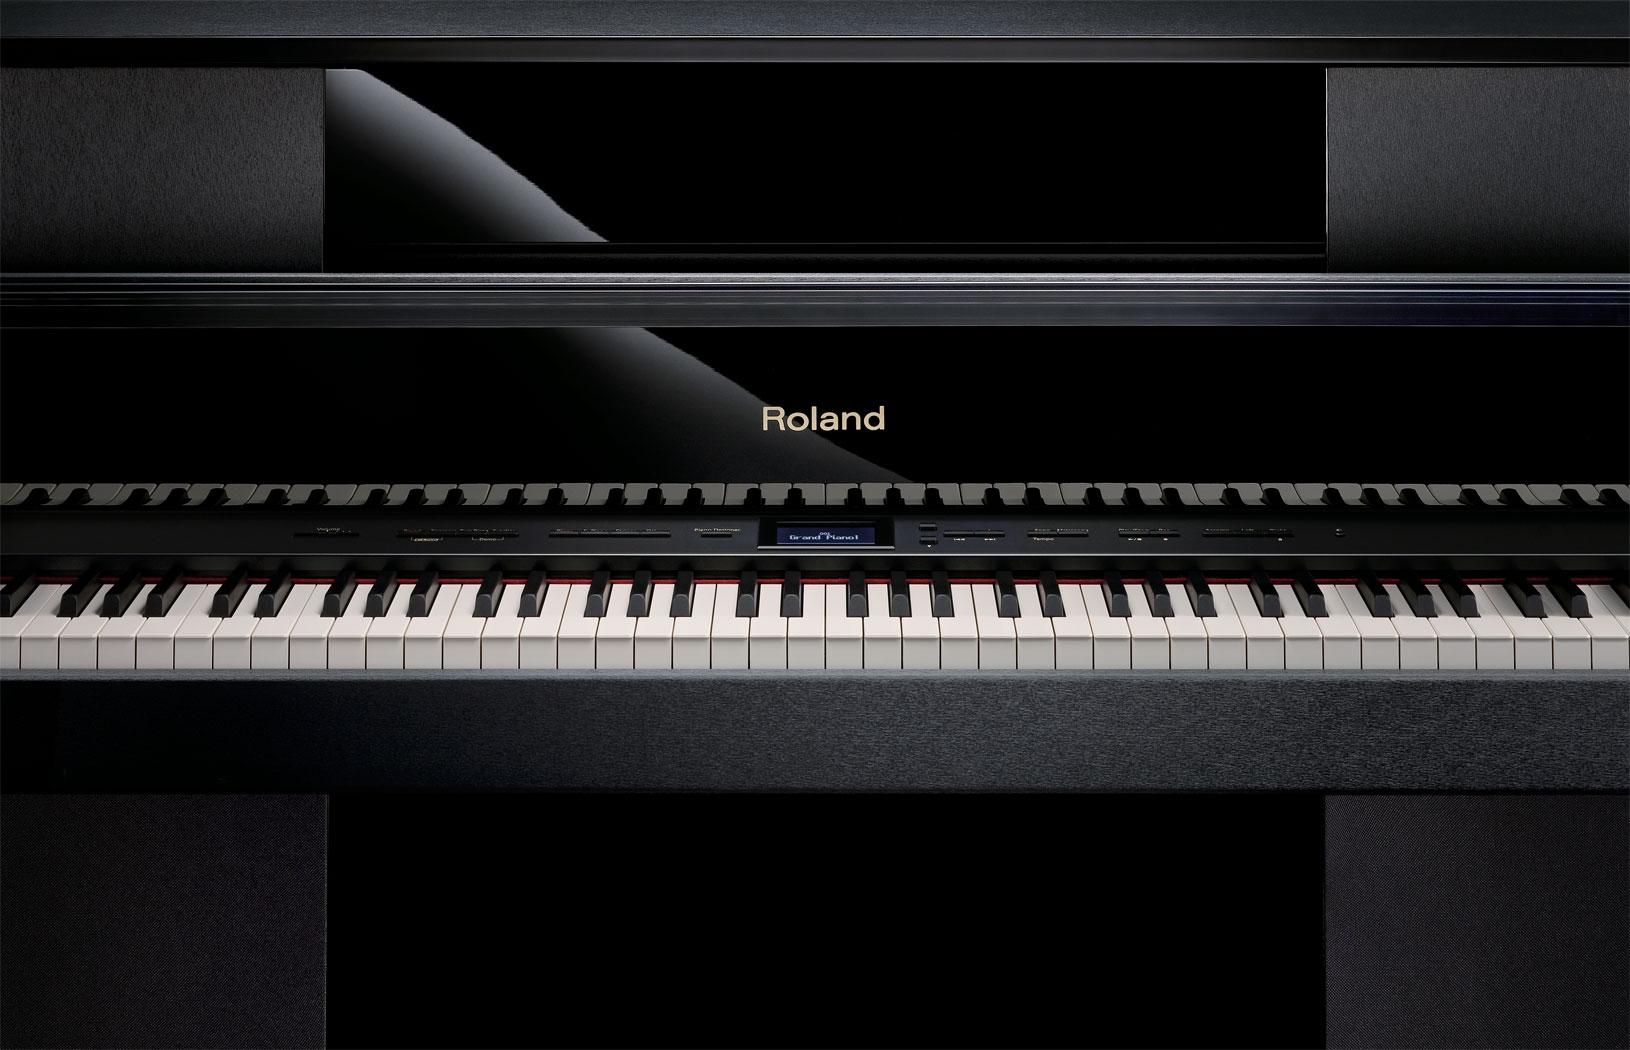 Roland - LX-10F | SuperNATURAL Piano